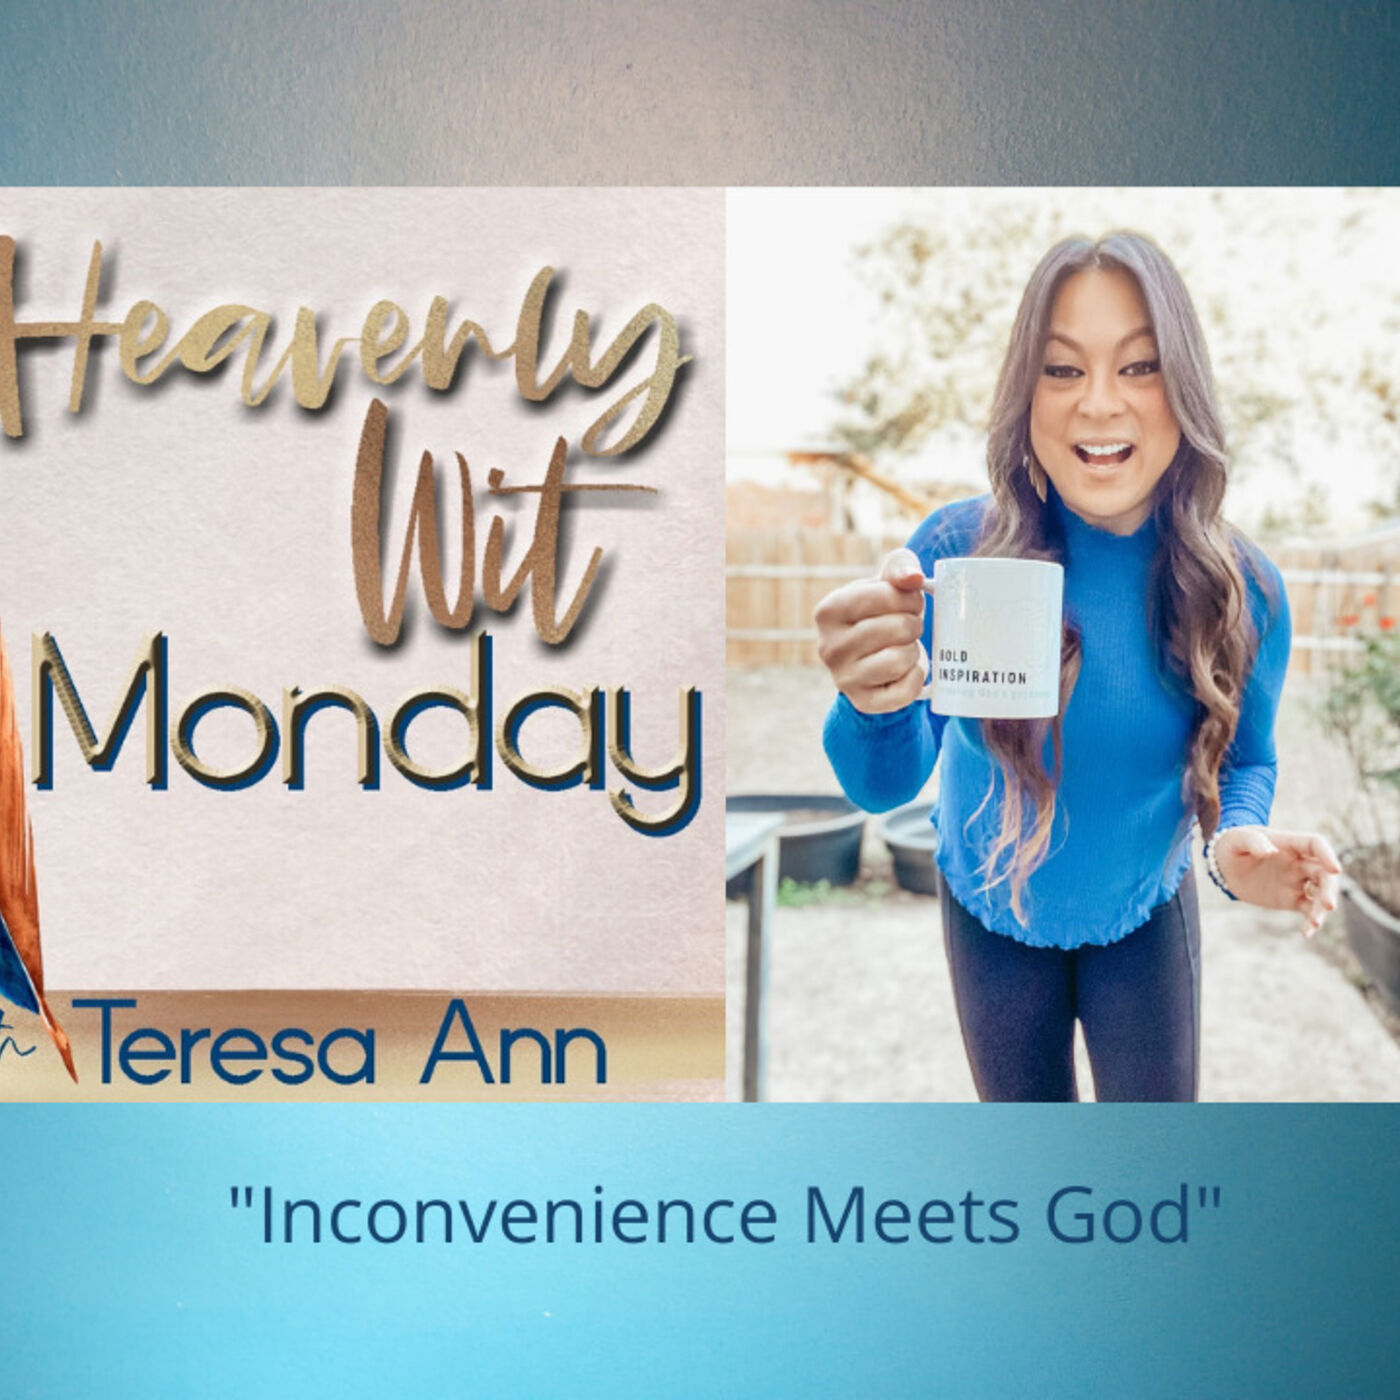 HEAVENLY WIT MONDAY   INCONVENIENCE MEETS GOD